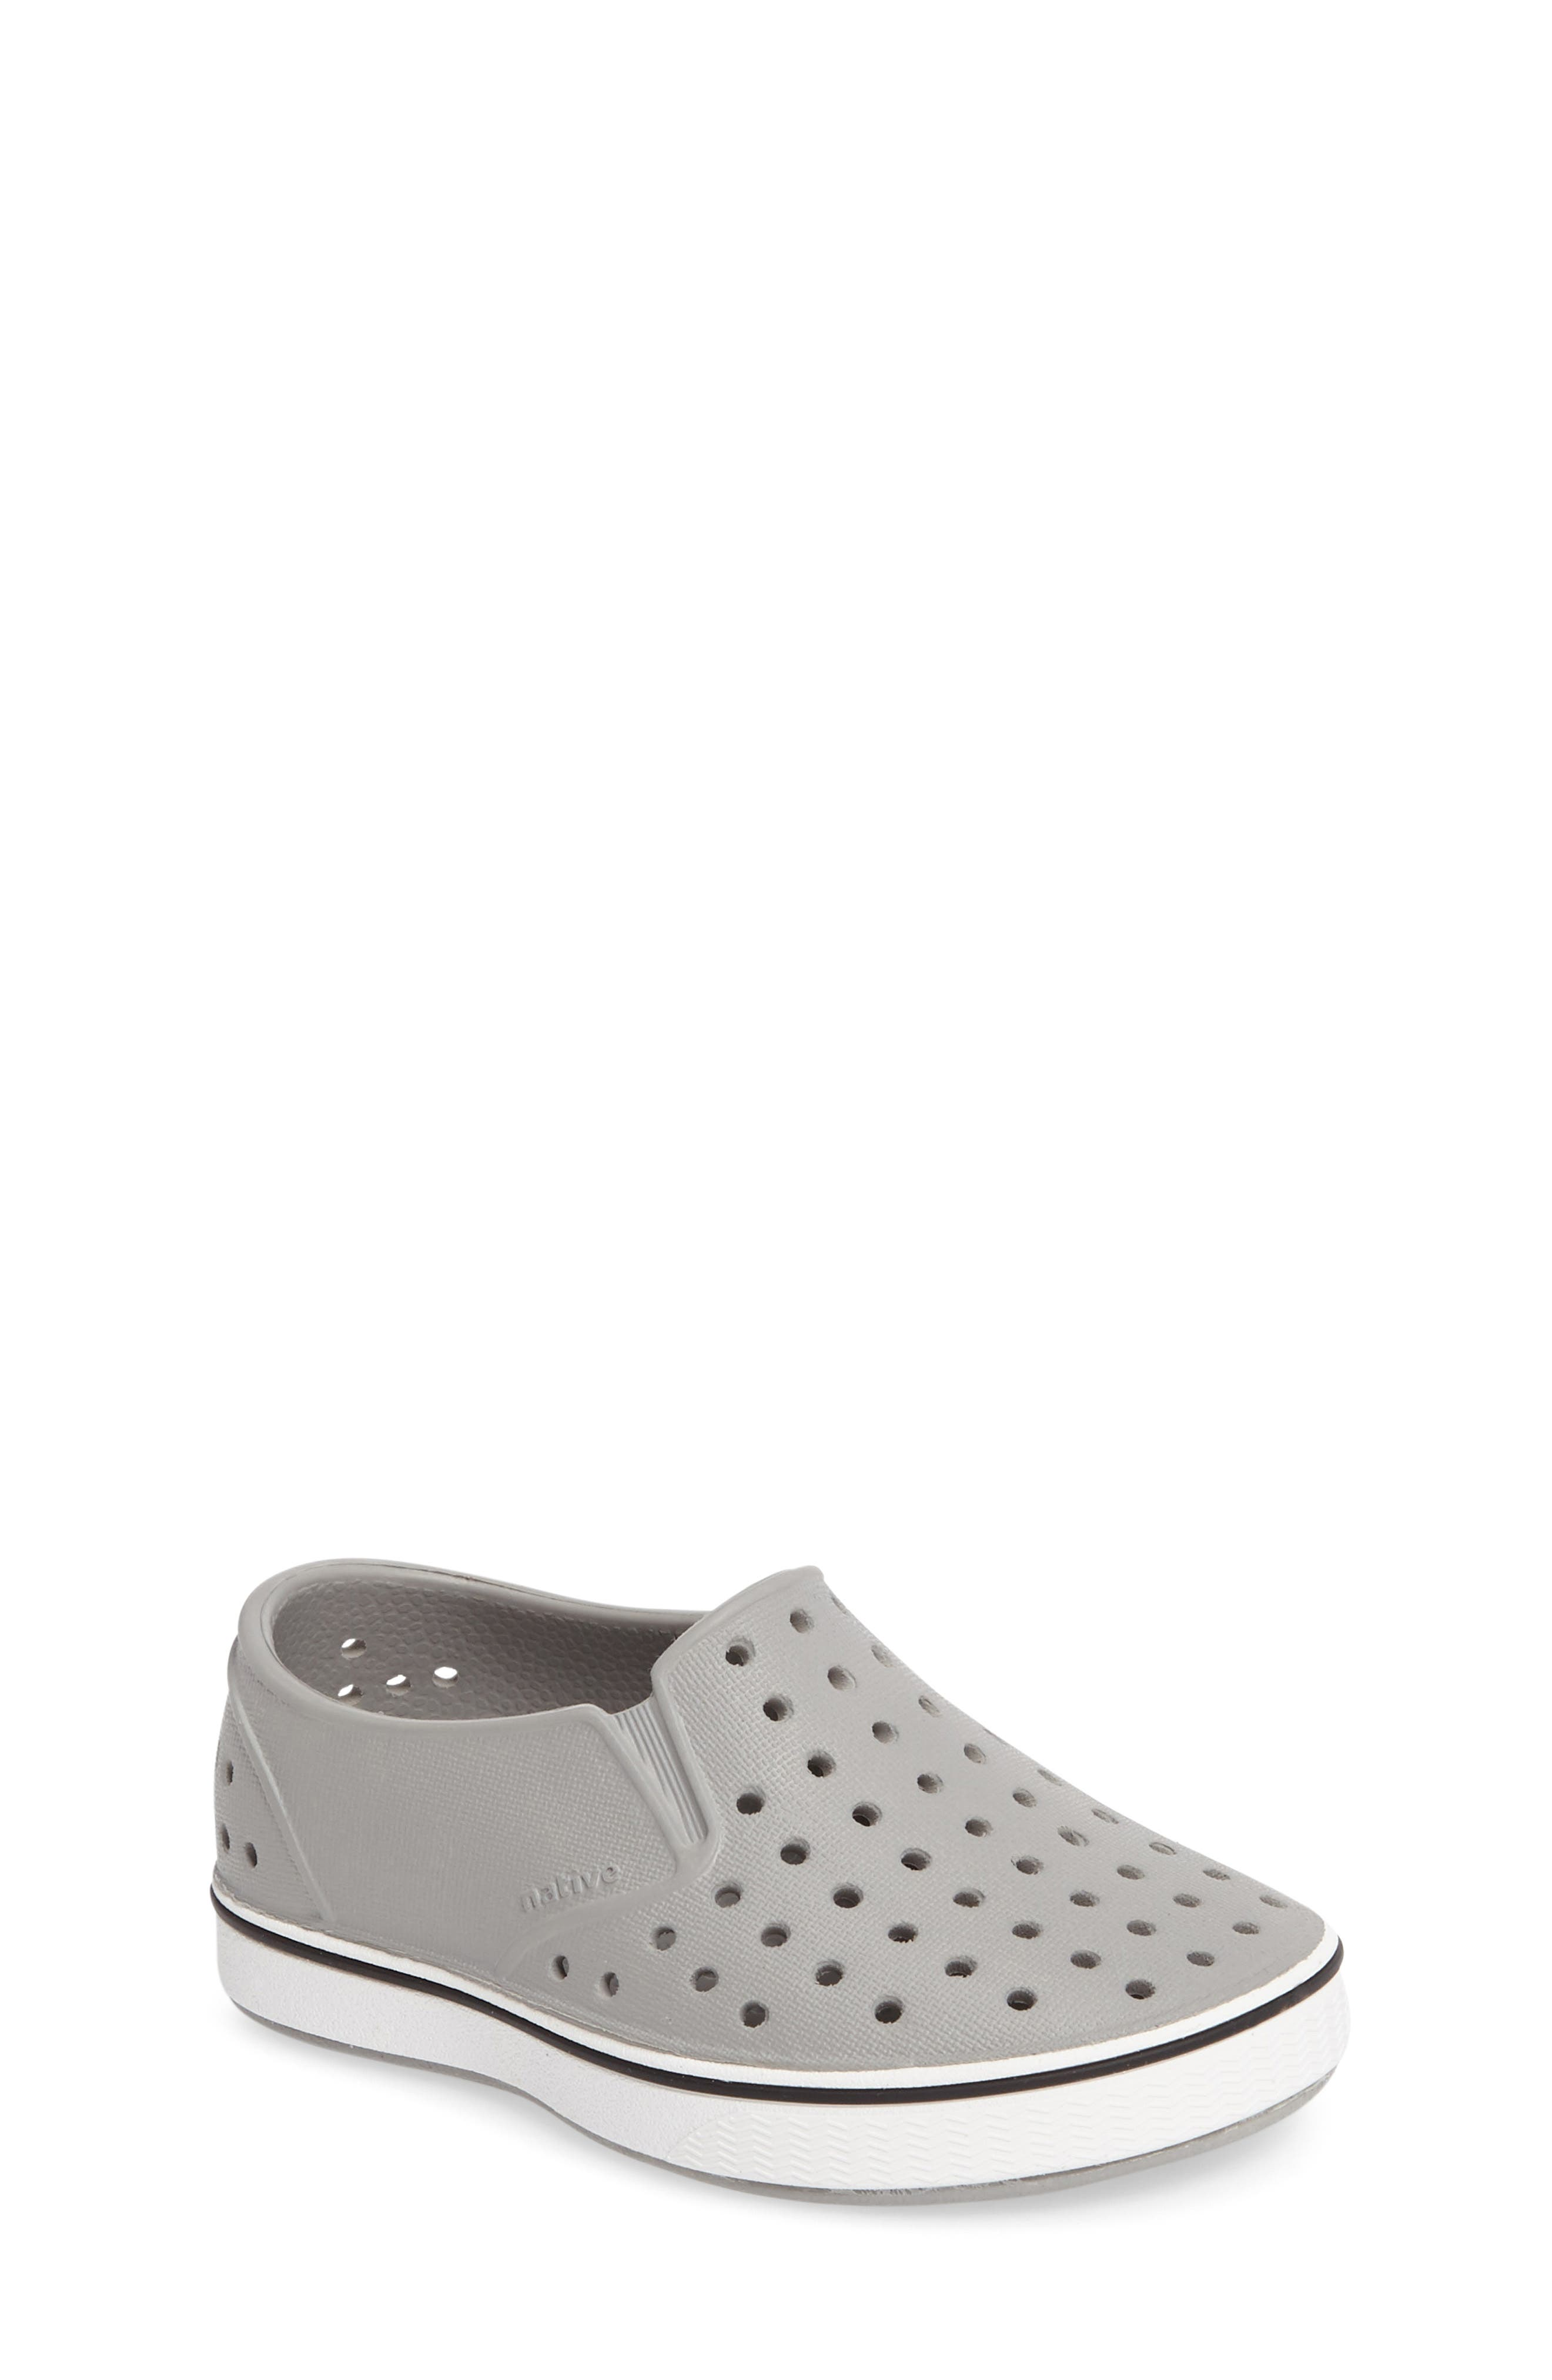 Miles Water Friendly Slip-On Vegan Sneaker, Main, color, PIGEON GREY/ SHELL WHITE